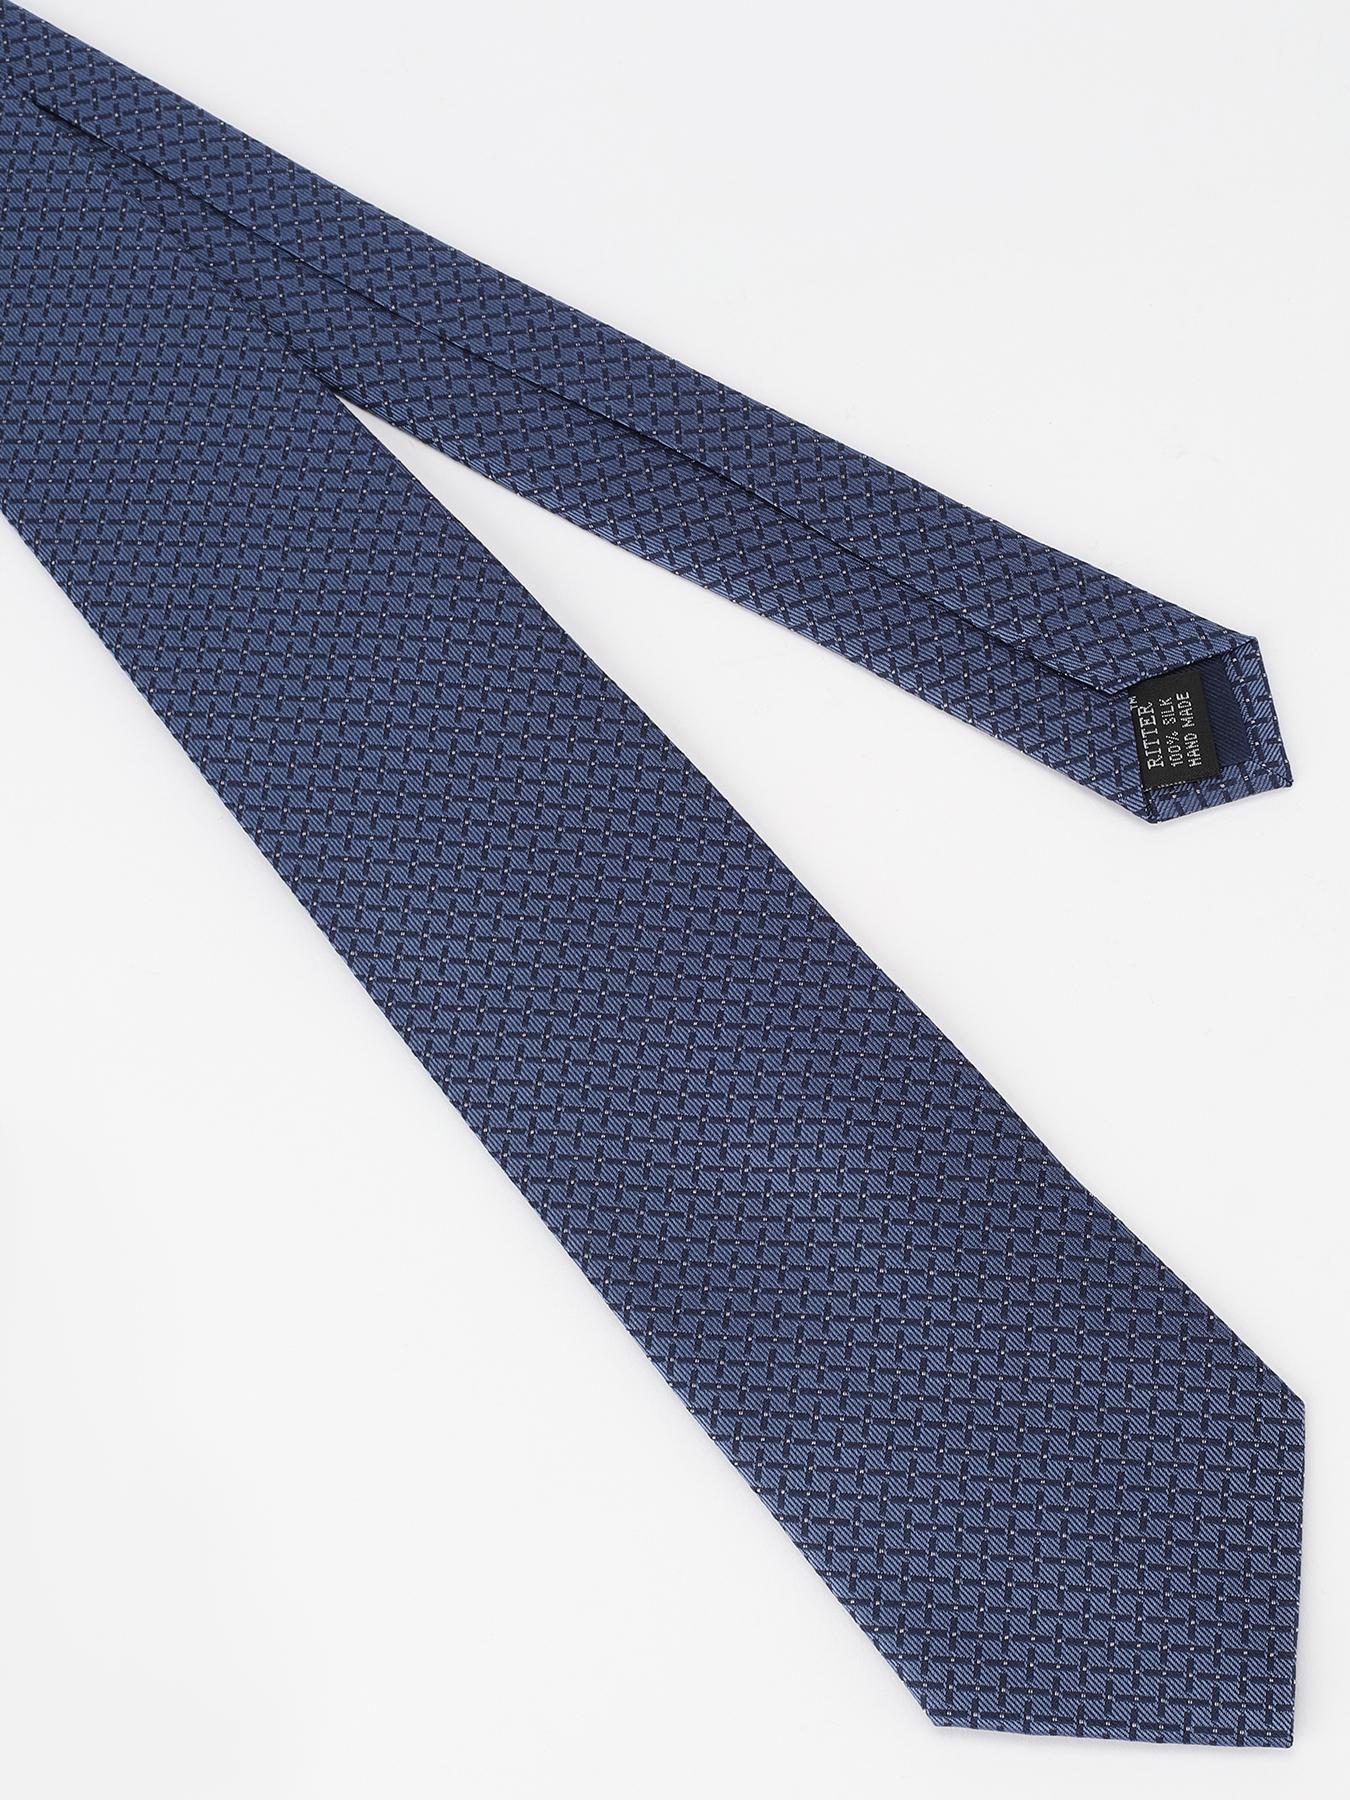 Ritter Шелковый галстук 357935-185 Фото 3